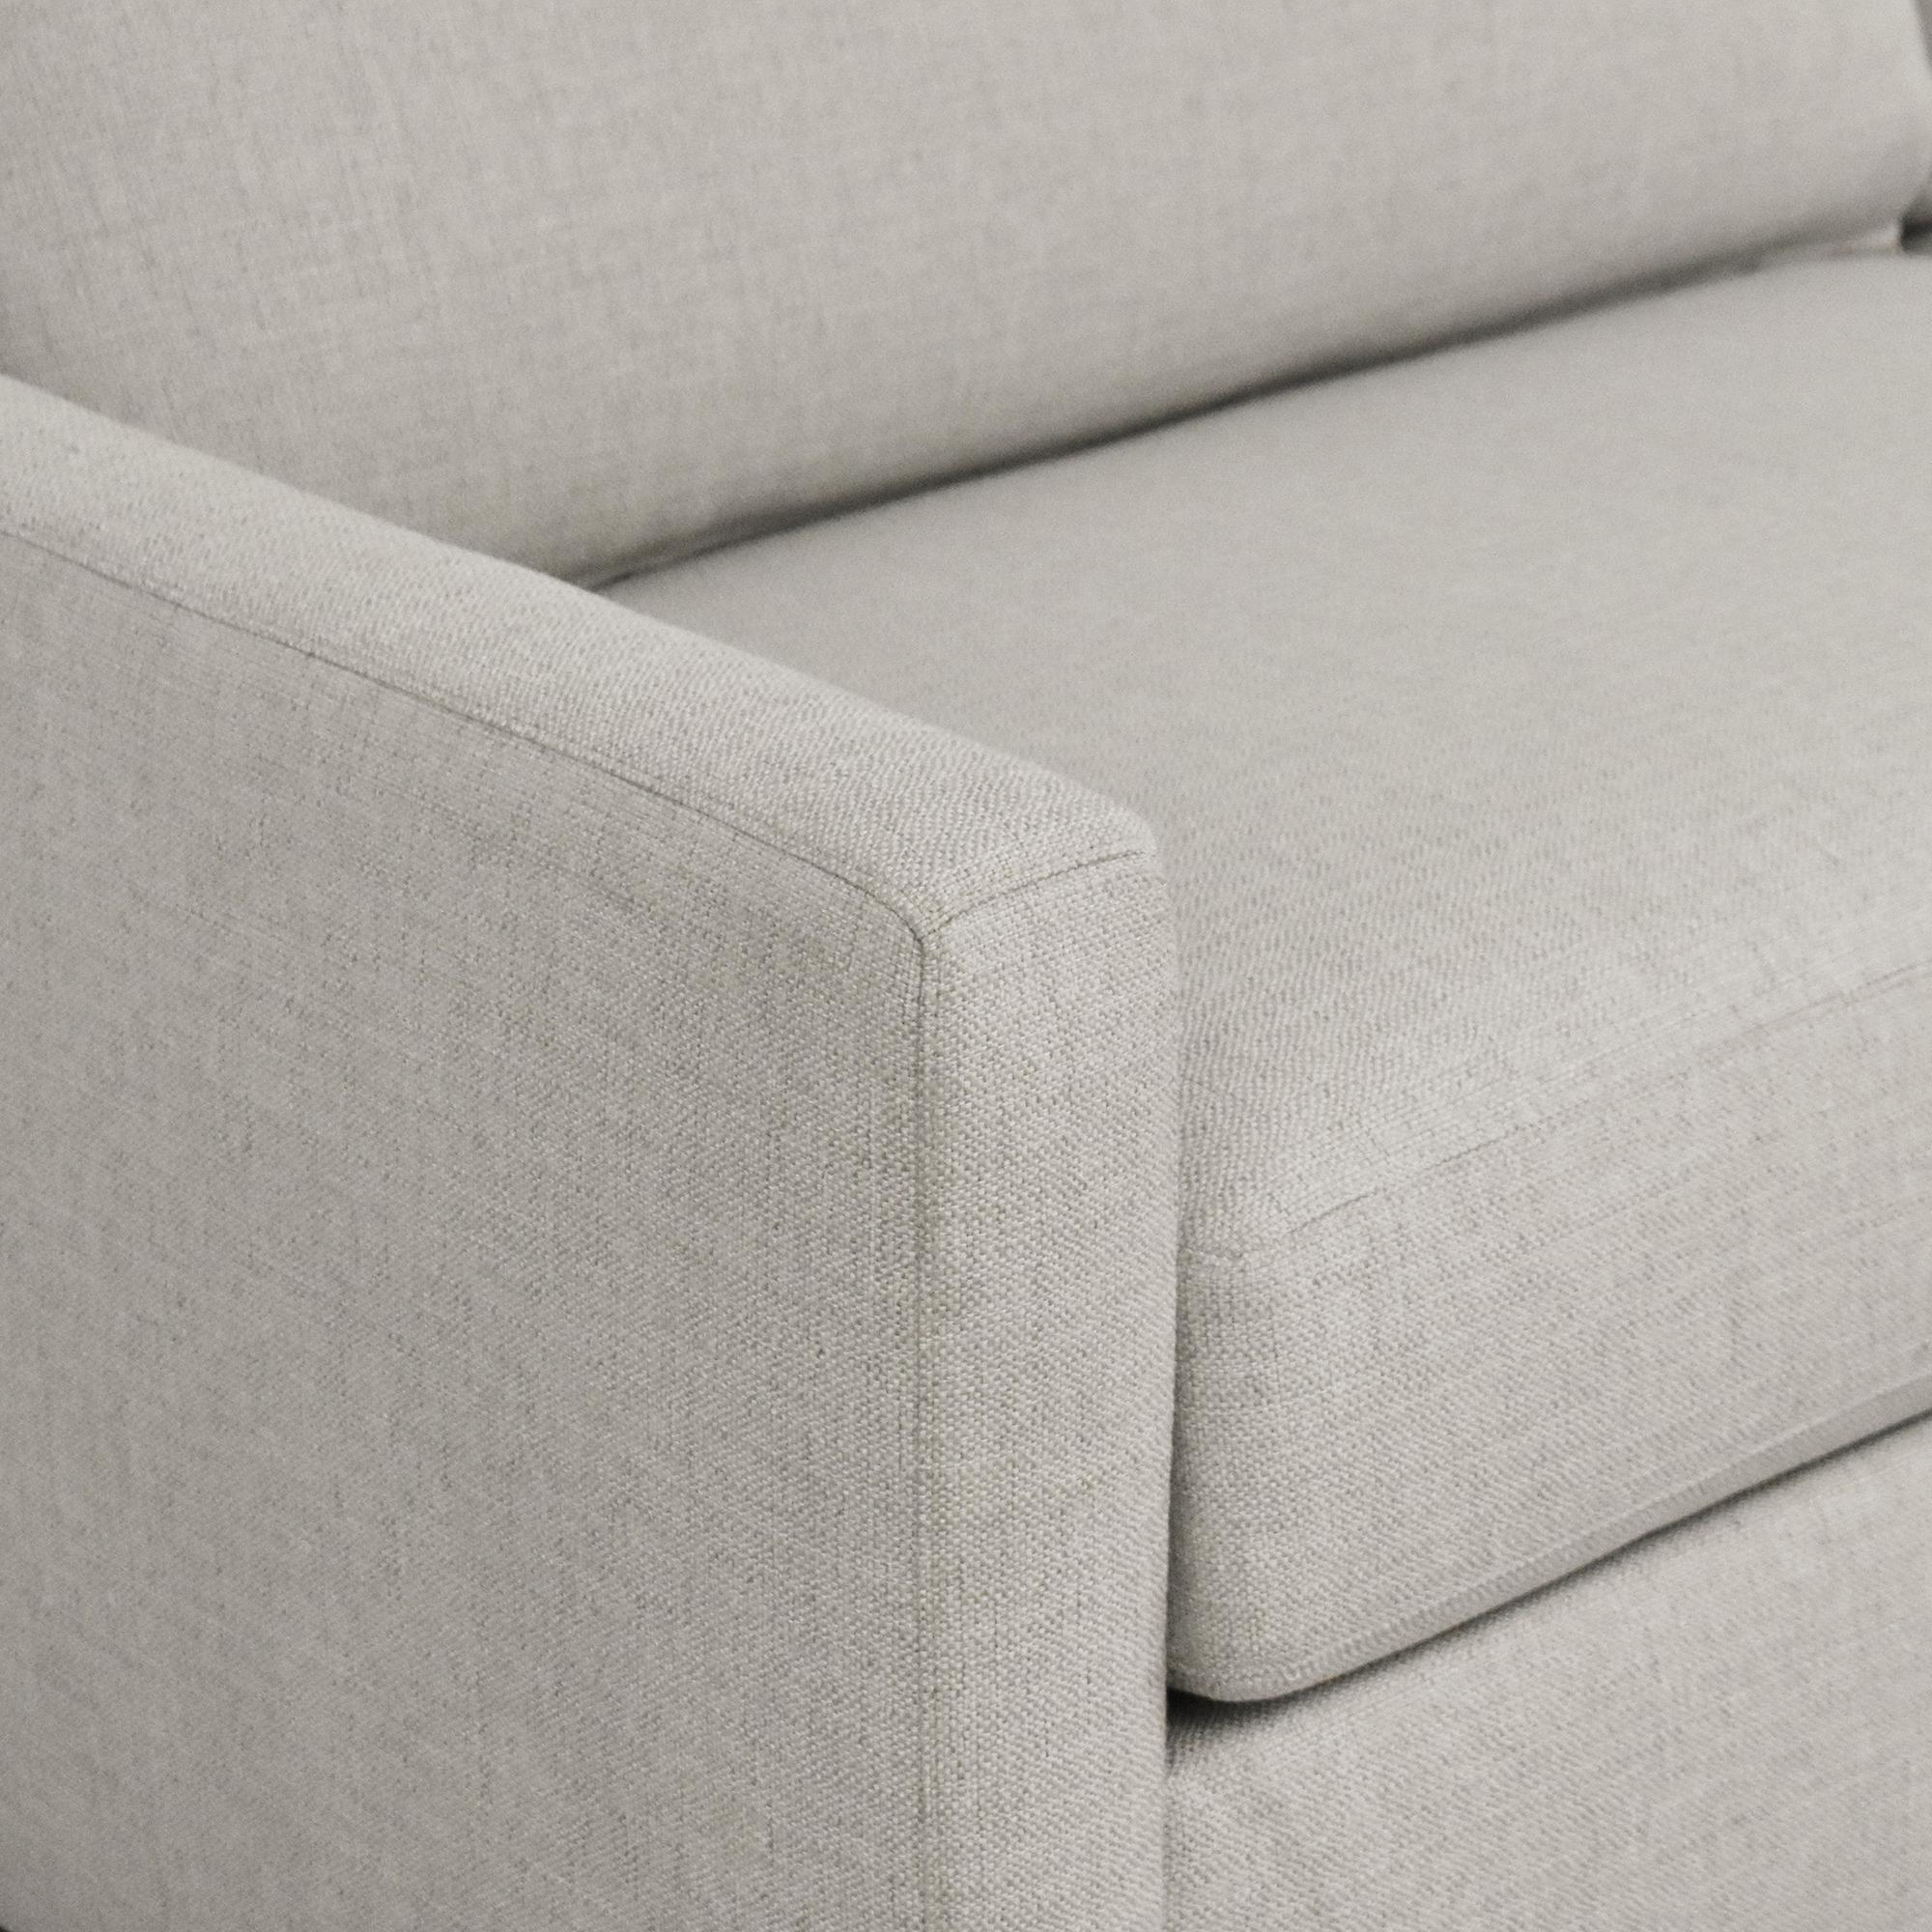 BenchMade Modern BenchMade Modern Couch Potato Lite Sofa nj